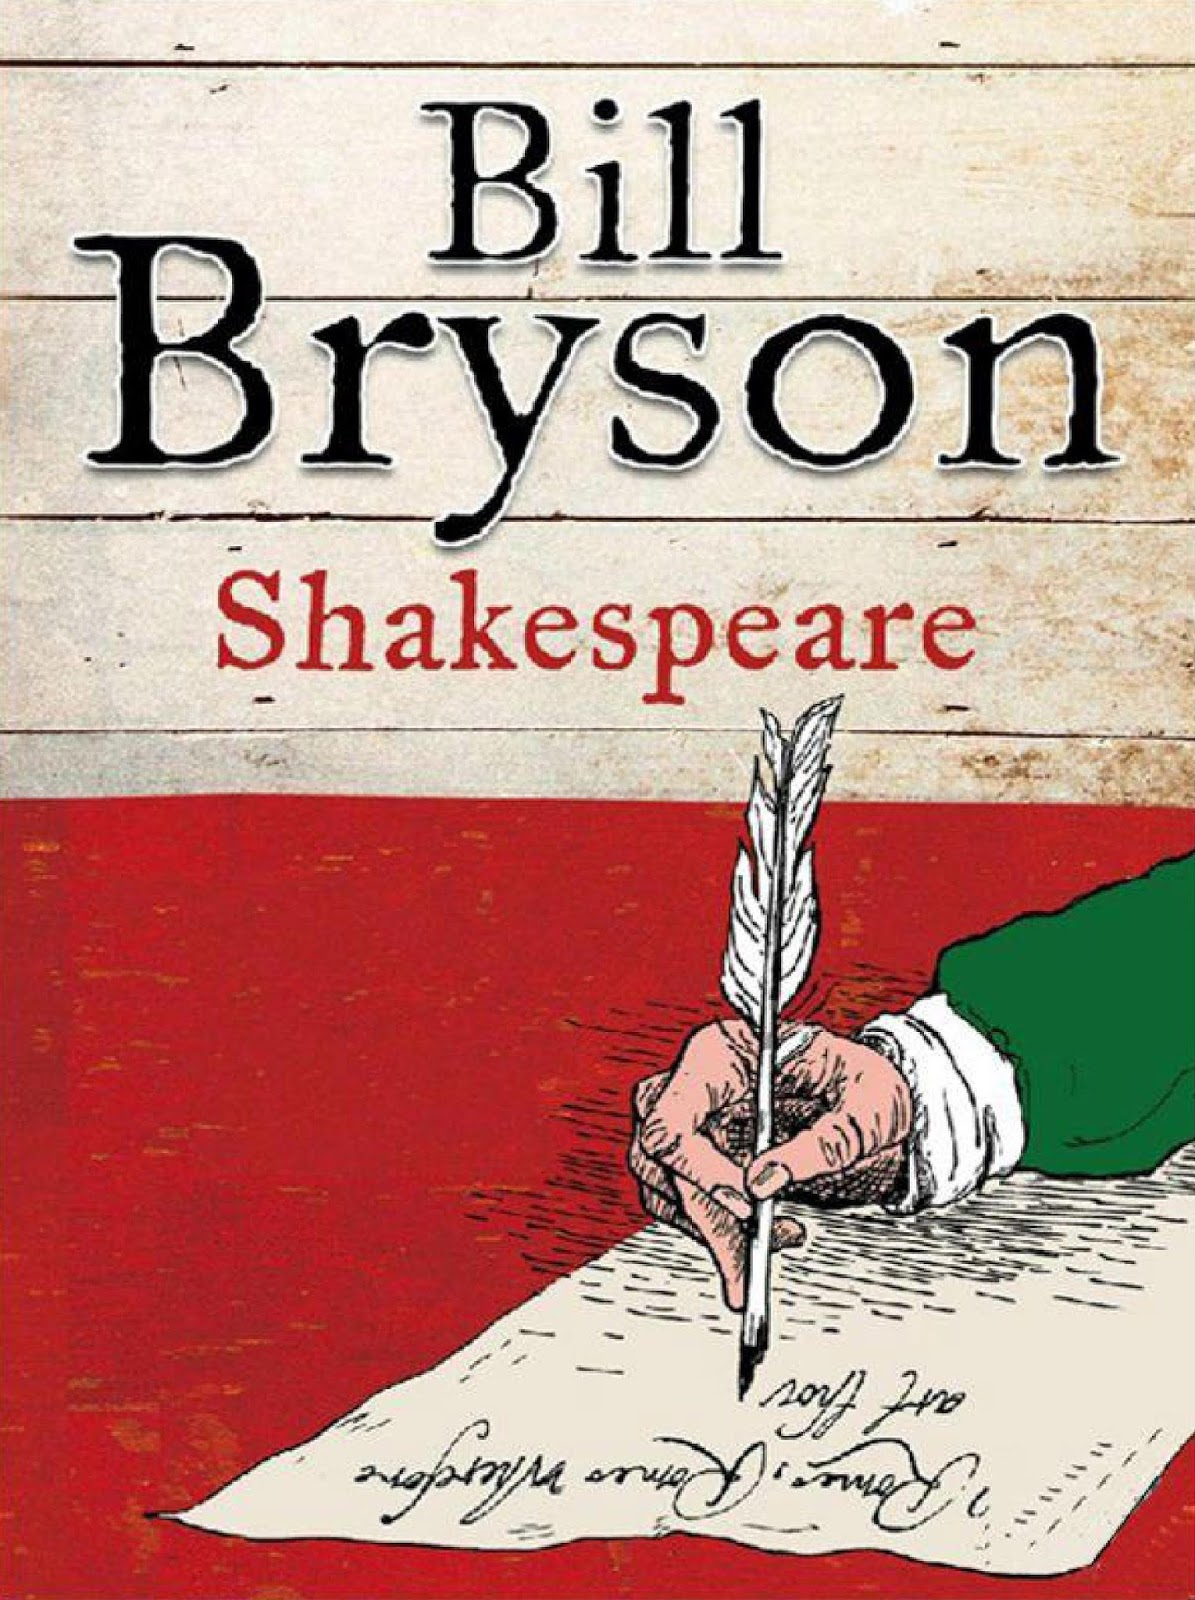 Shakespeare – Bill Bryson